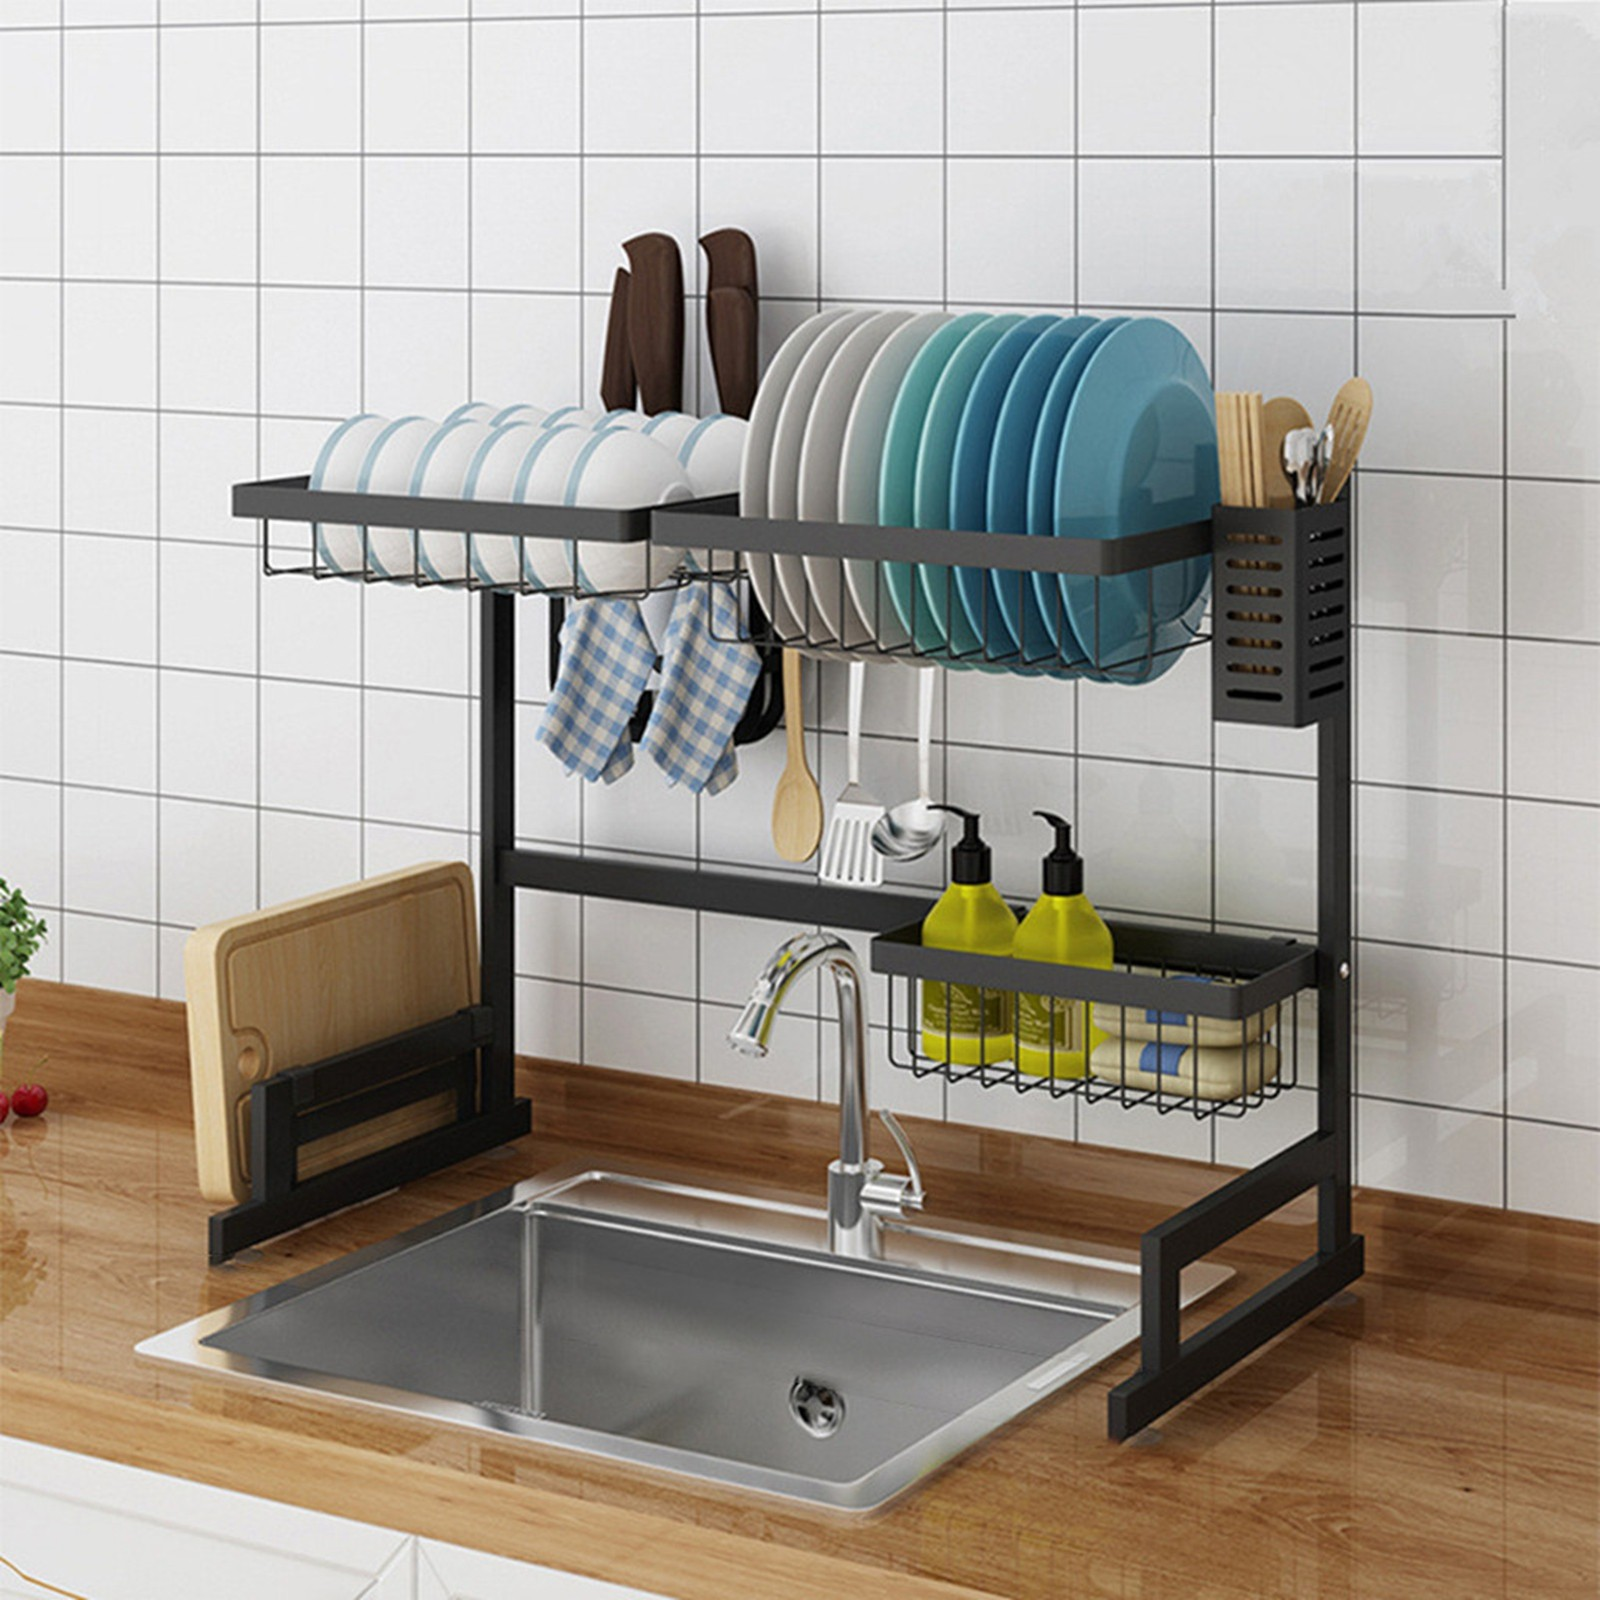 Dish Drying Rack Over Sink Display Drainer Kitchen Utensils Holder US Stock